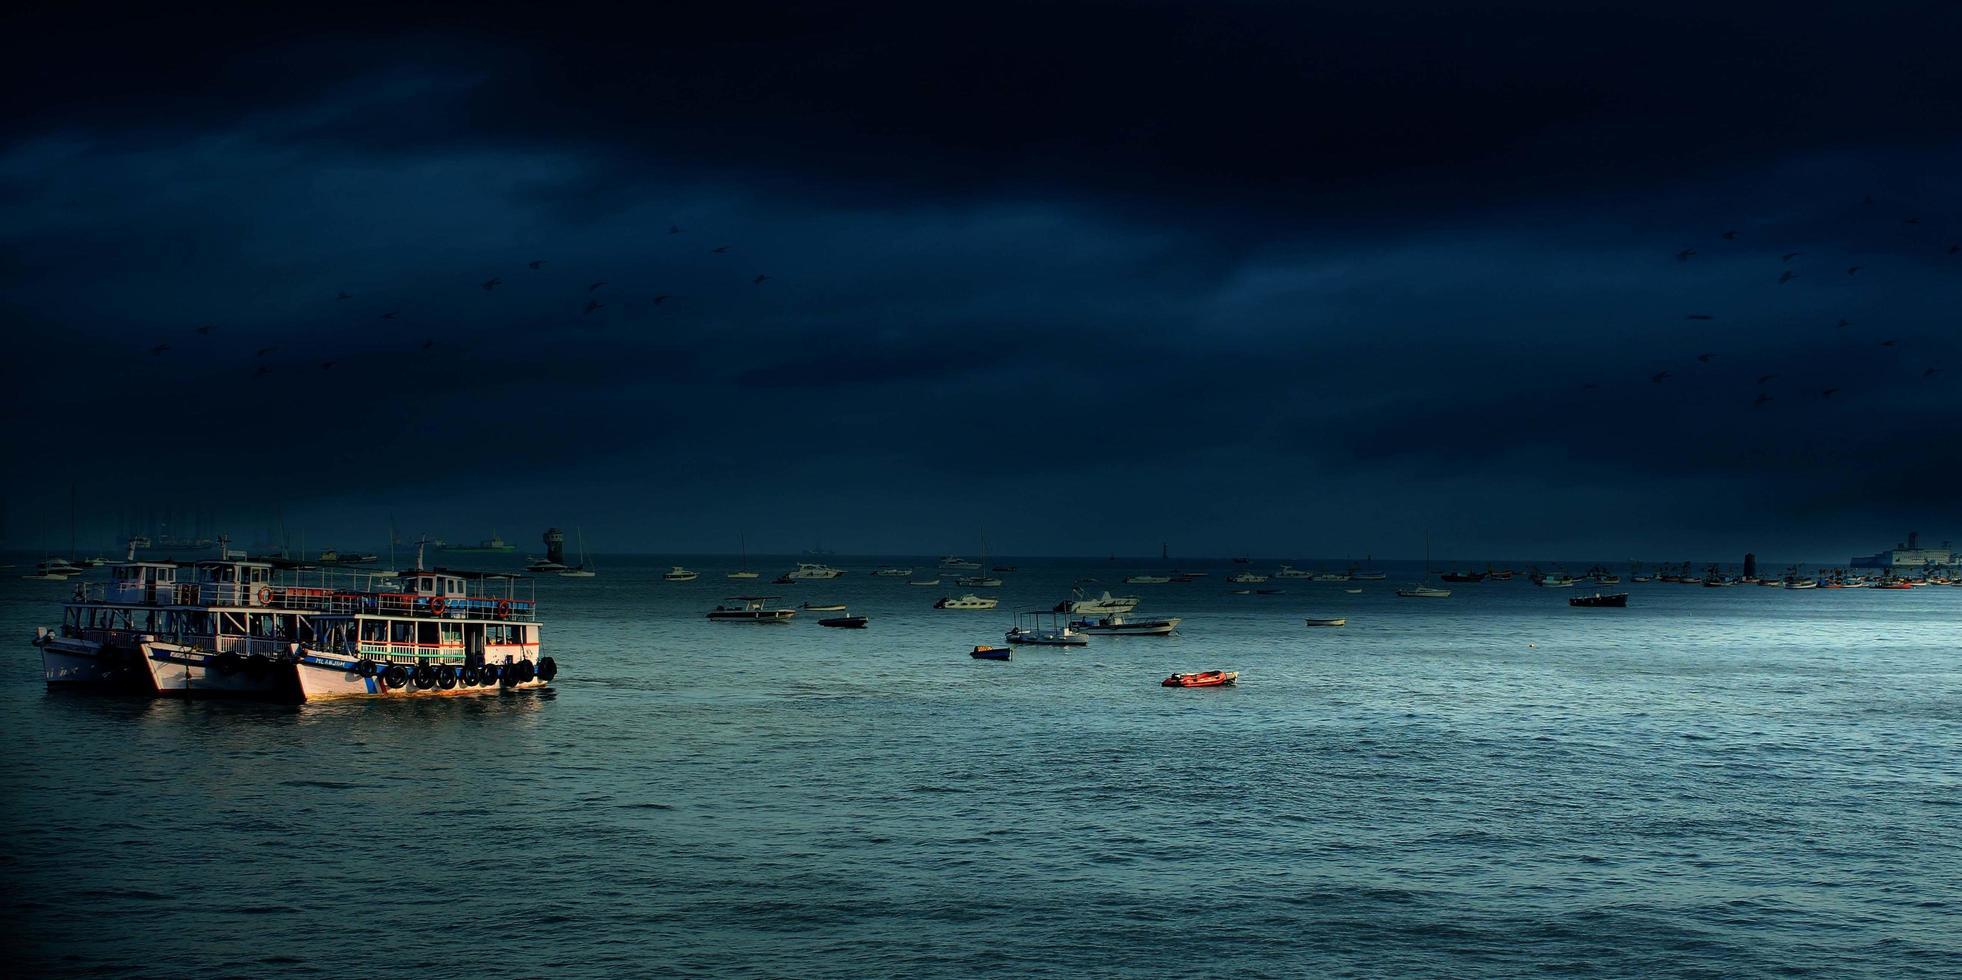 Boats on sea at night photo